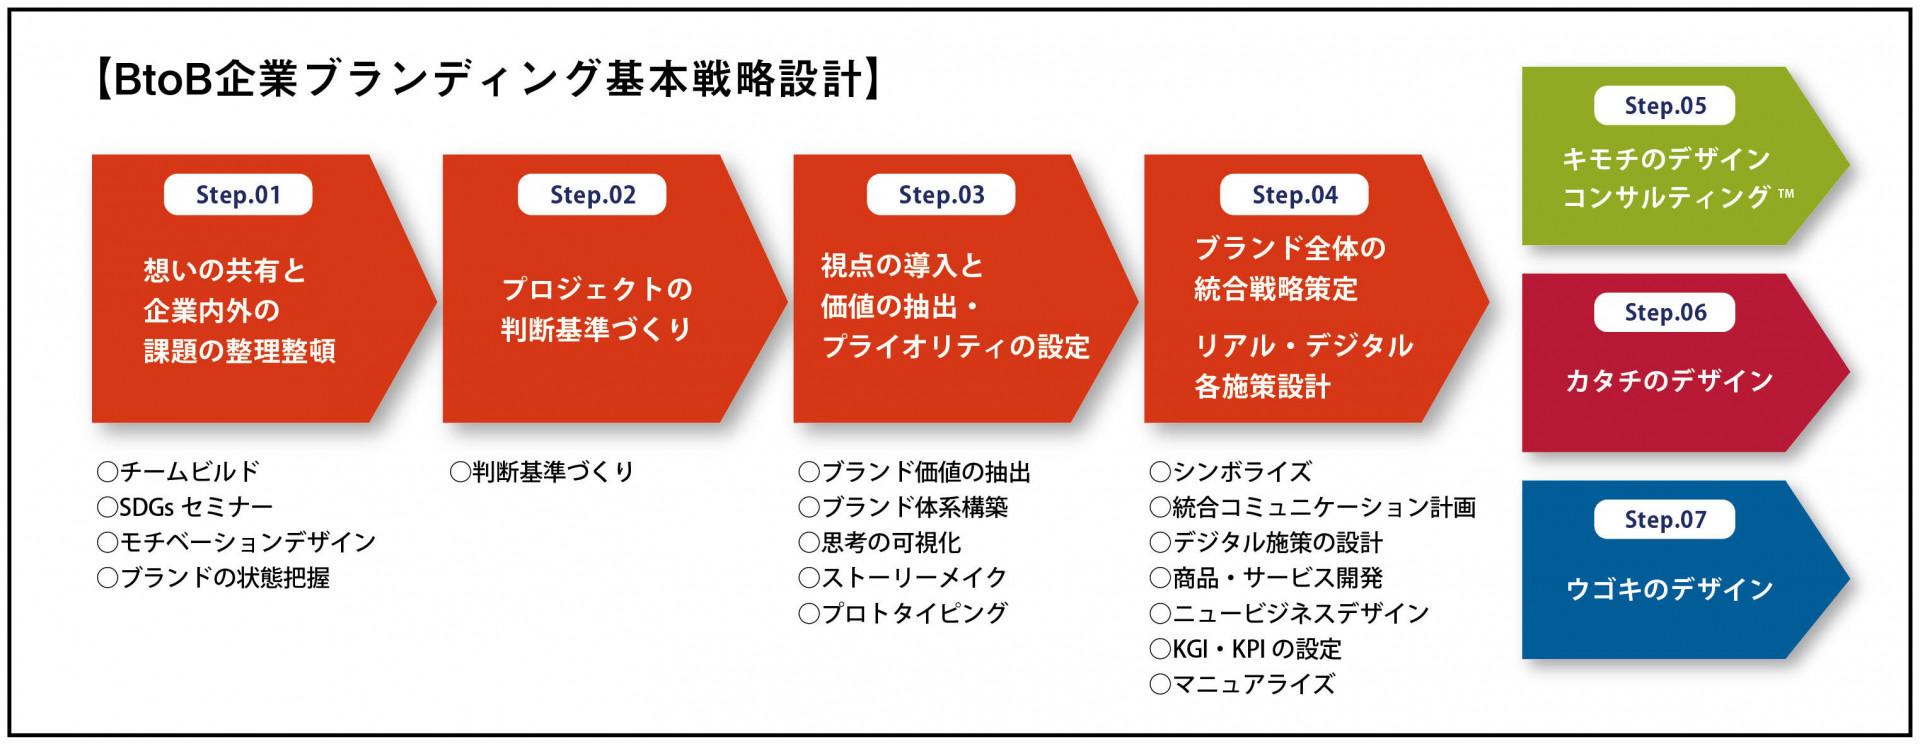 BtoB企業ブランディング基本戦略設計